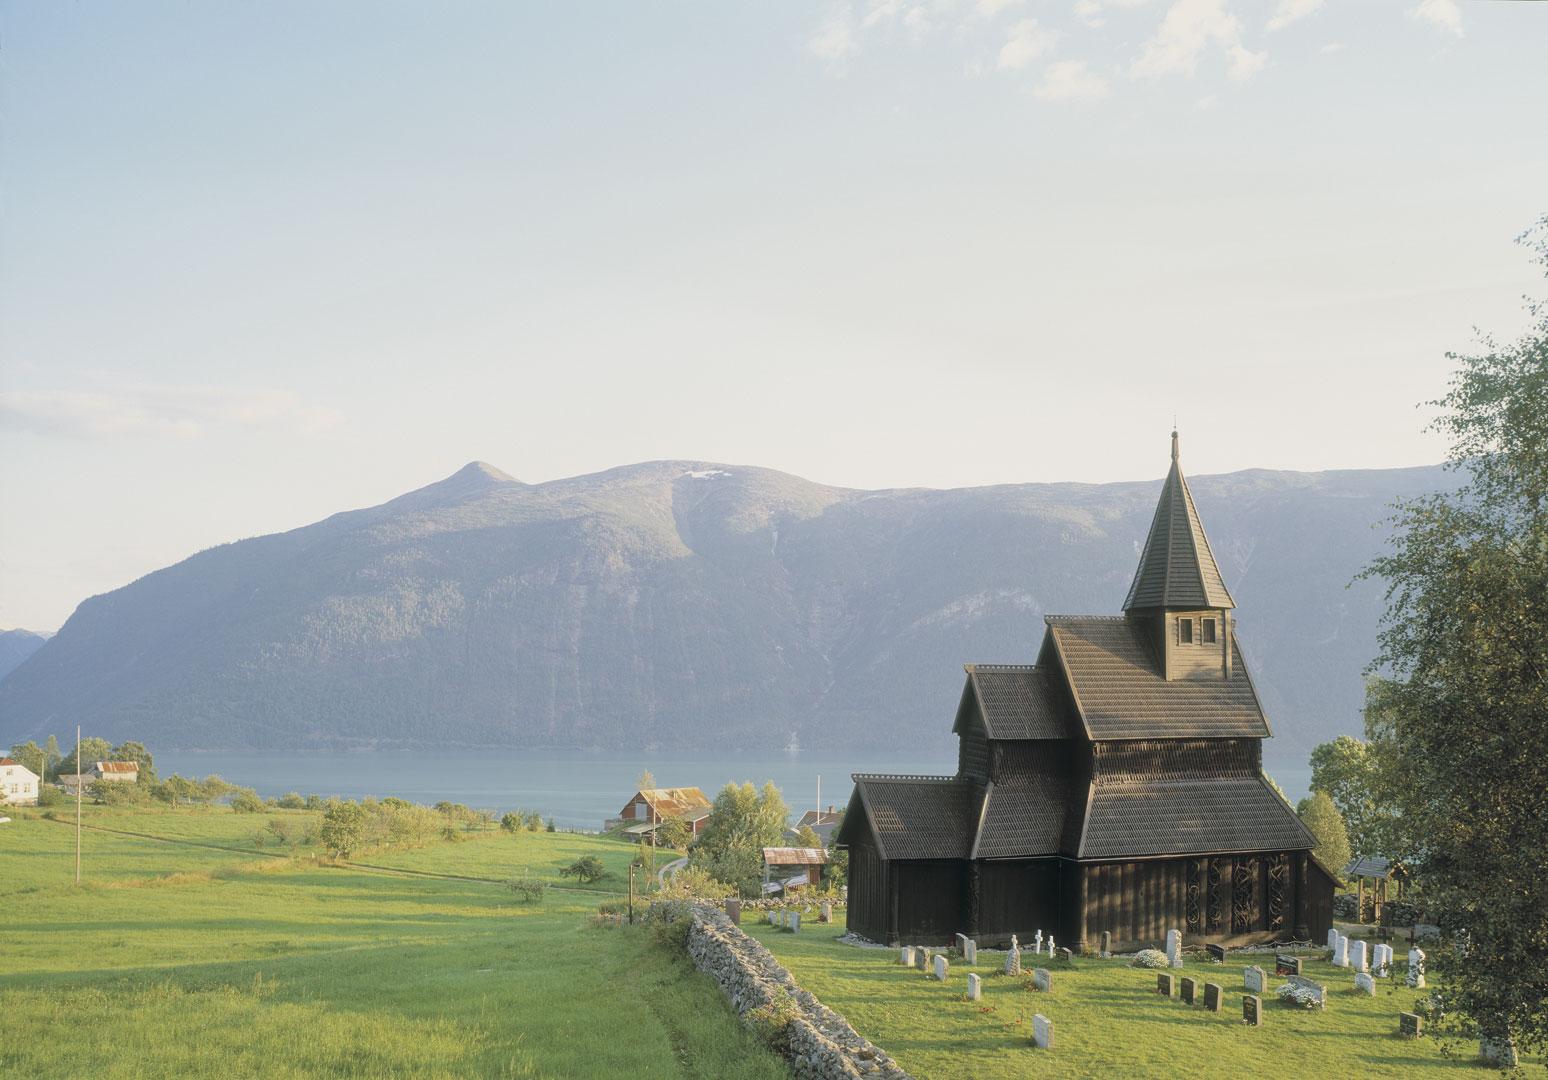 Urnes stavkirke - kulturminne med verdensarvstatus. Foto: Jiri Havran / Riksantikvaren